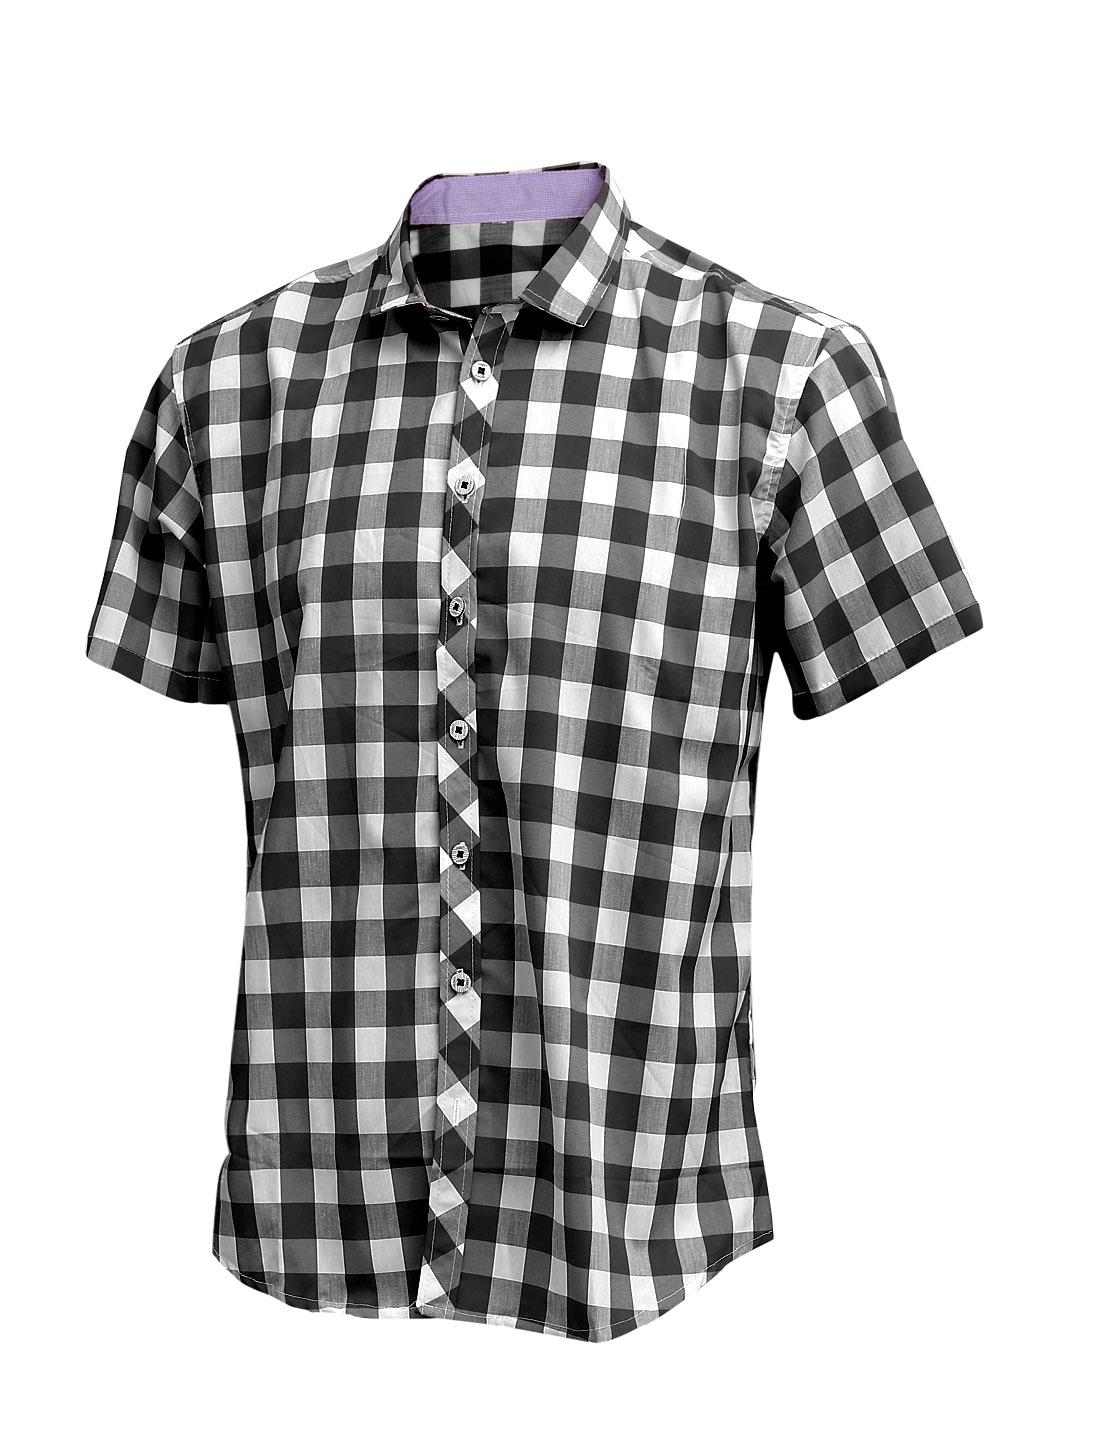 Men New Style Short Sleeve Button Up Plaids Pattern Shirt Black M